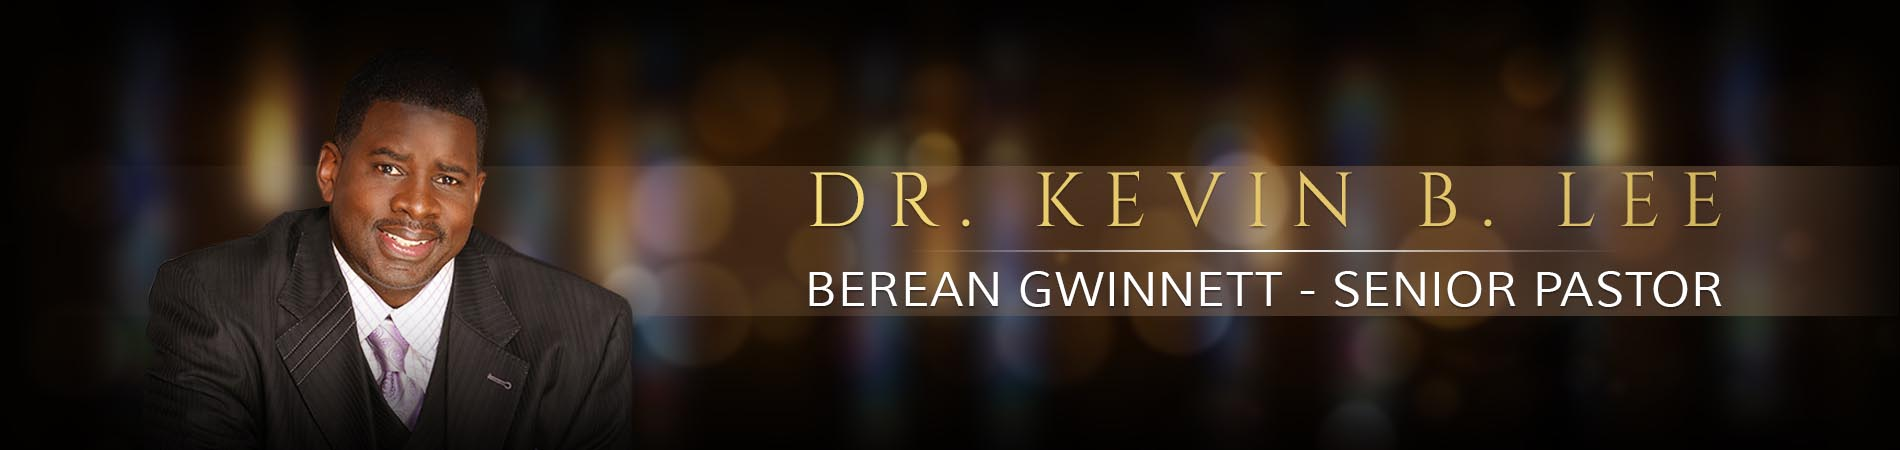 Dr Kevin B Lee - Berean Christian Church - Gwinett Senior Pastor